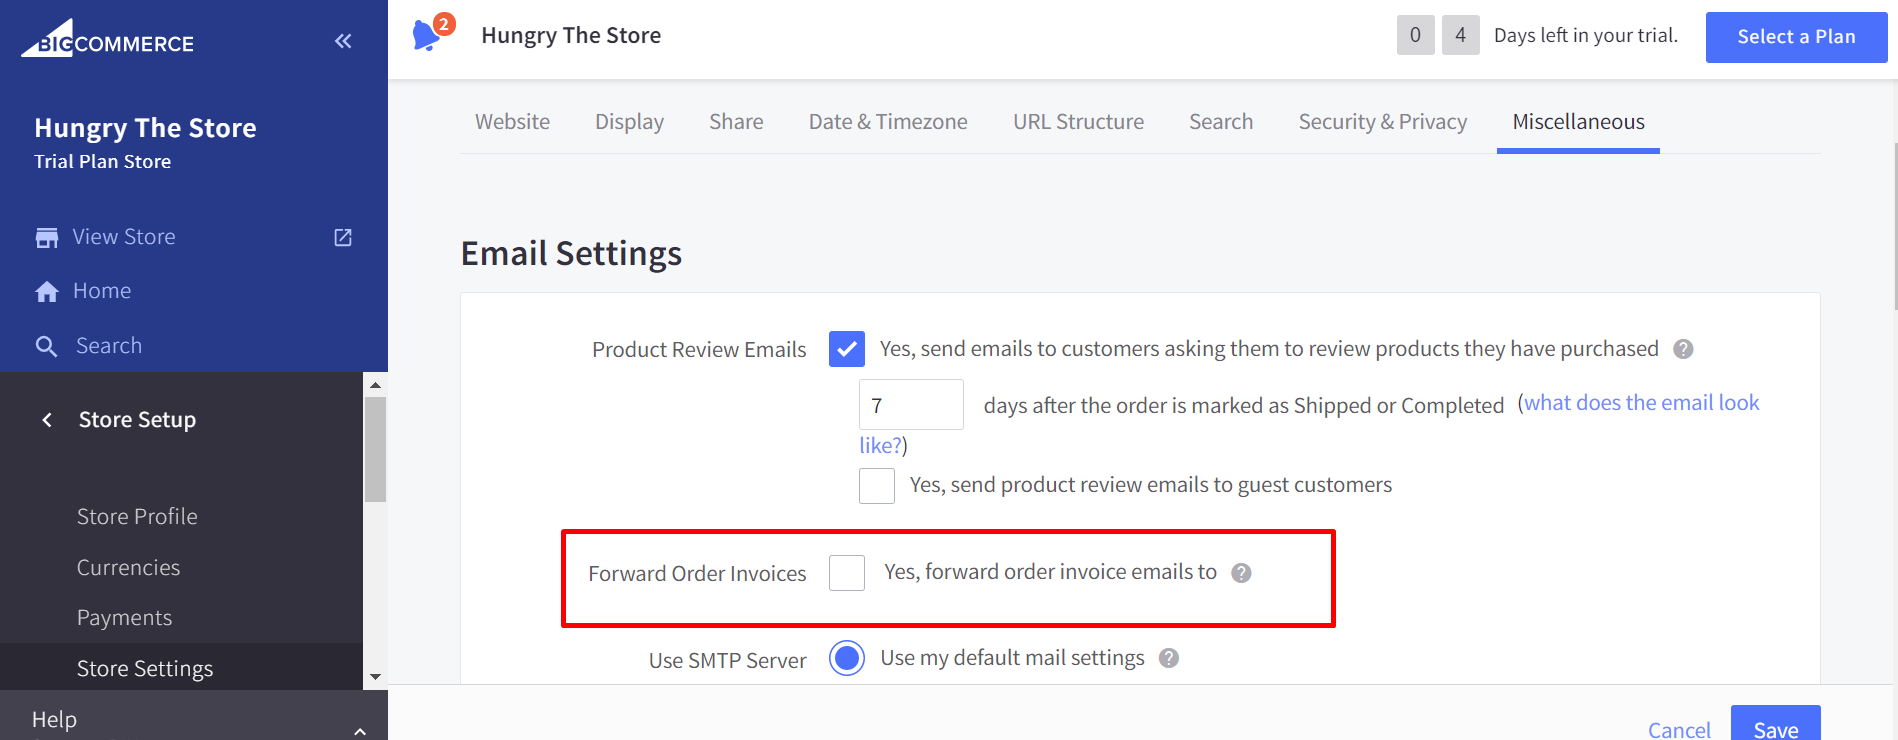 Check the Forward Order Invoices box